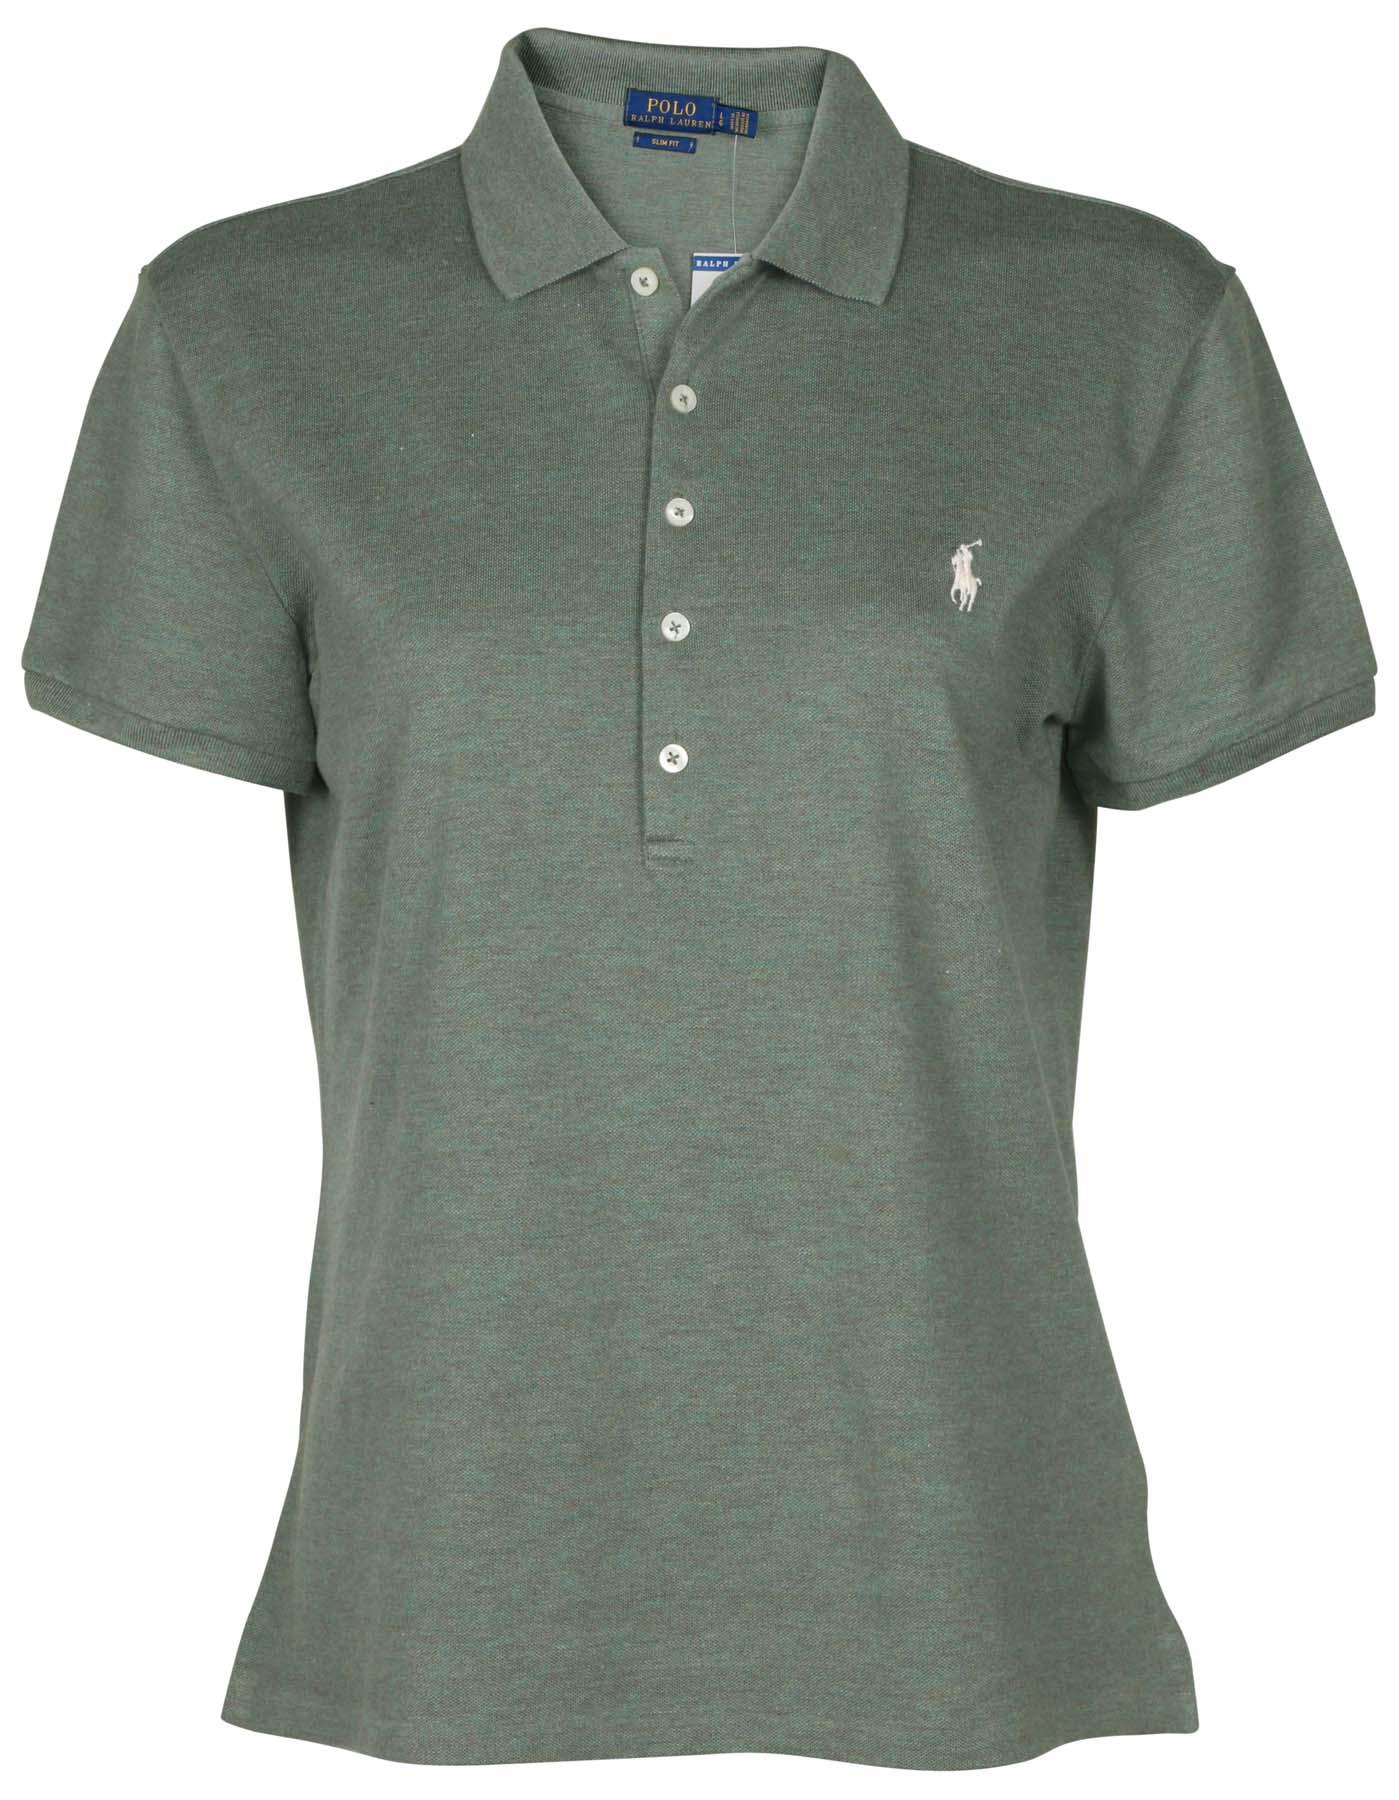 b379460023235 Grey Polo Shirts Womens